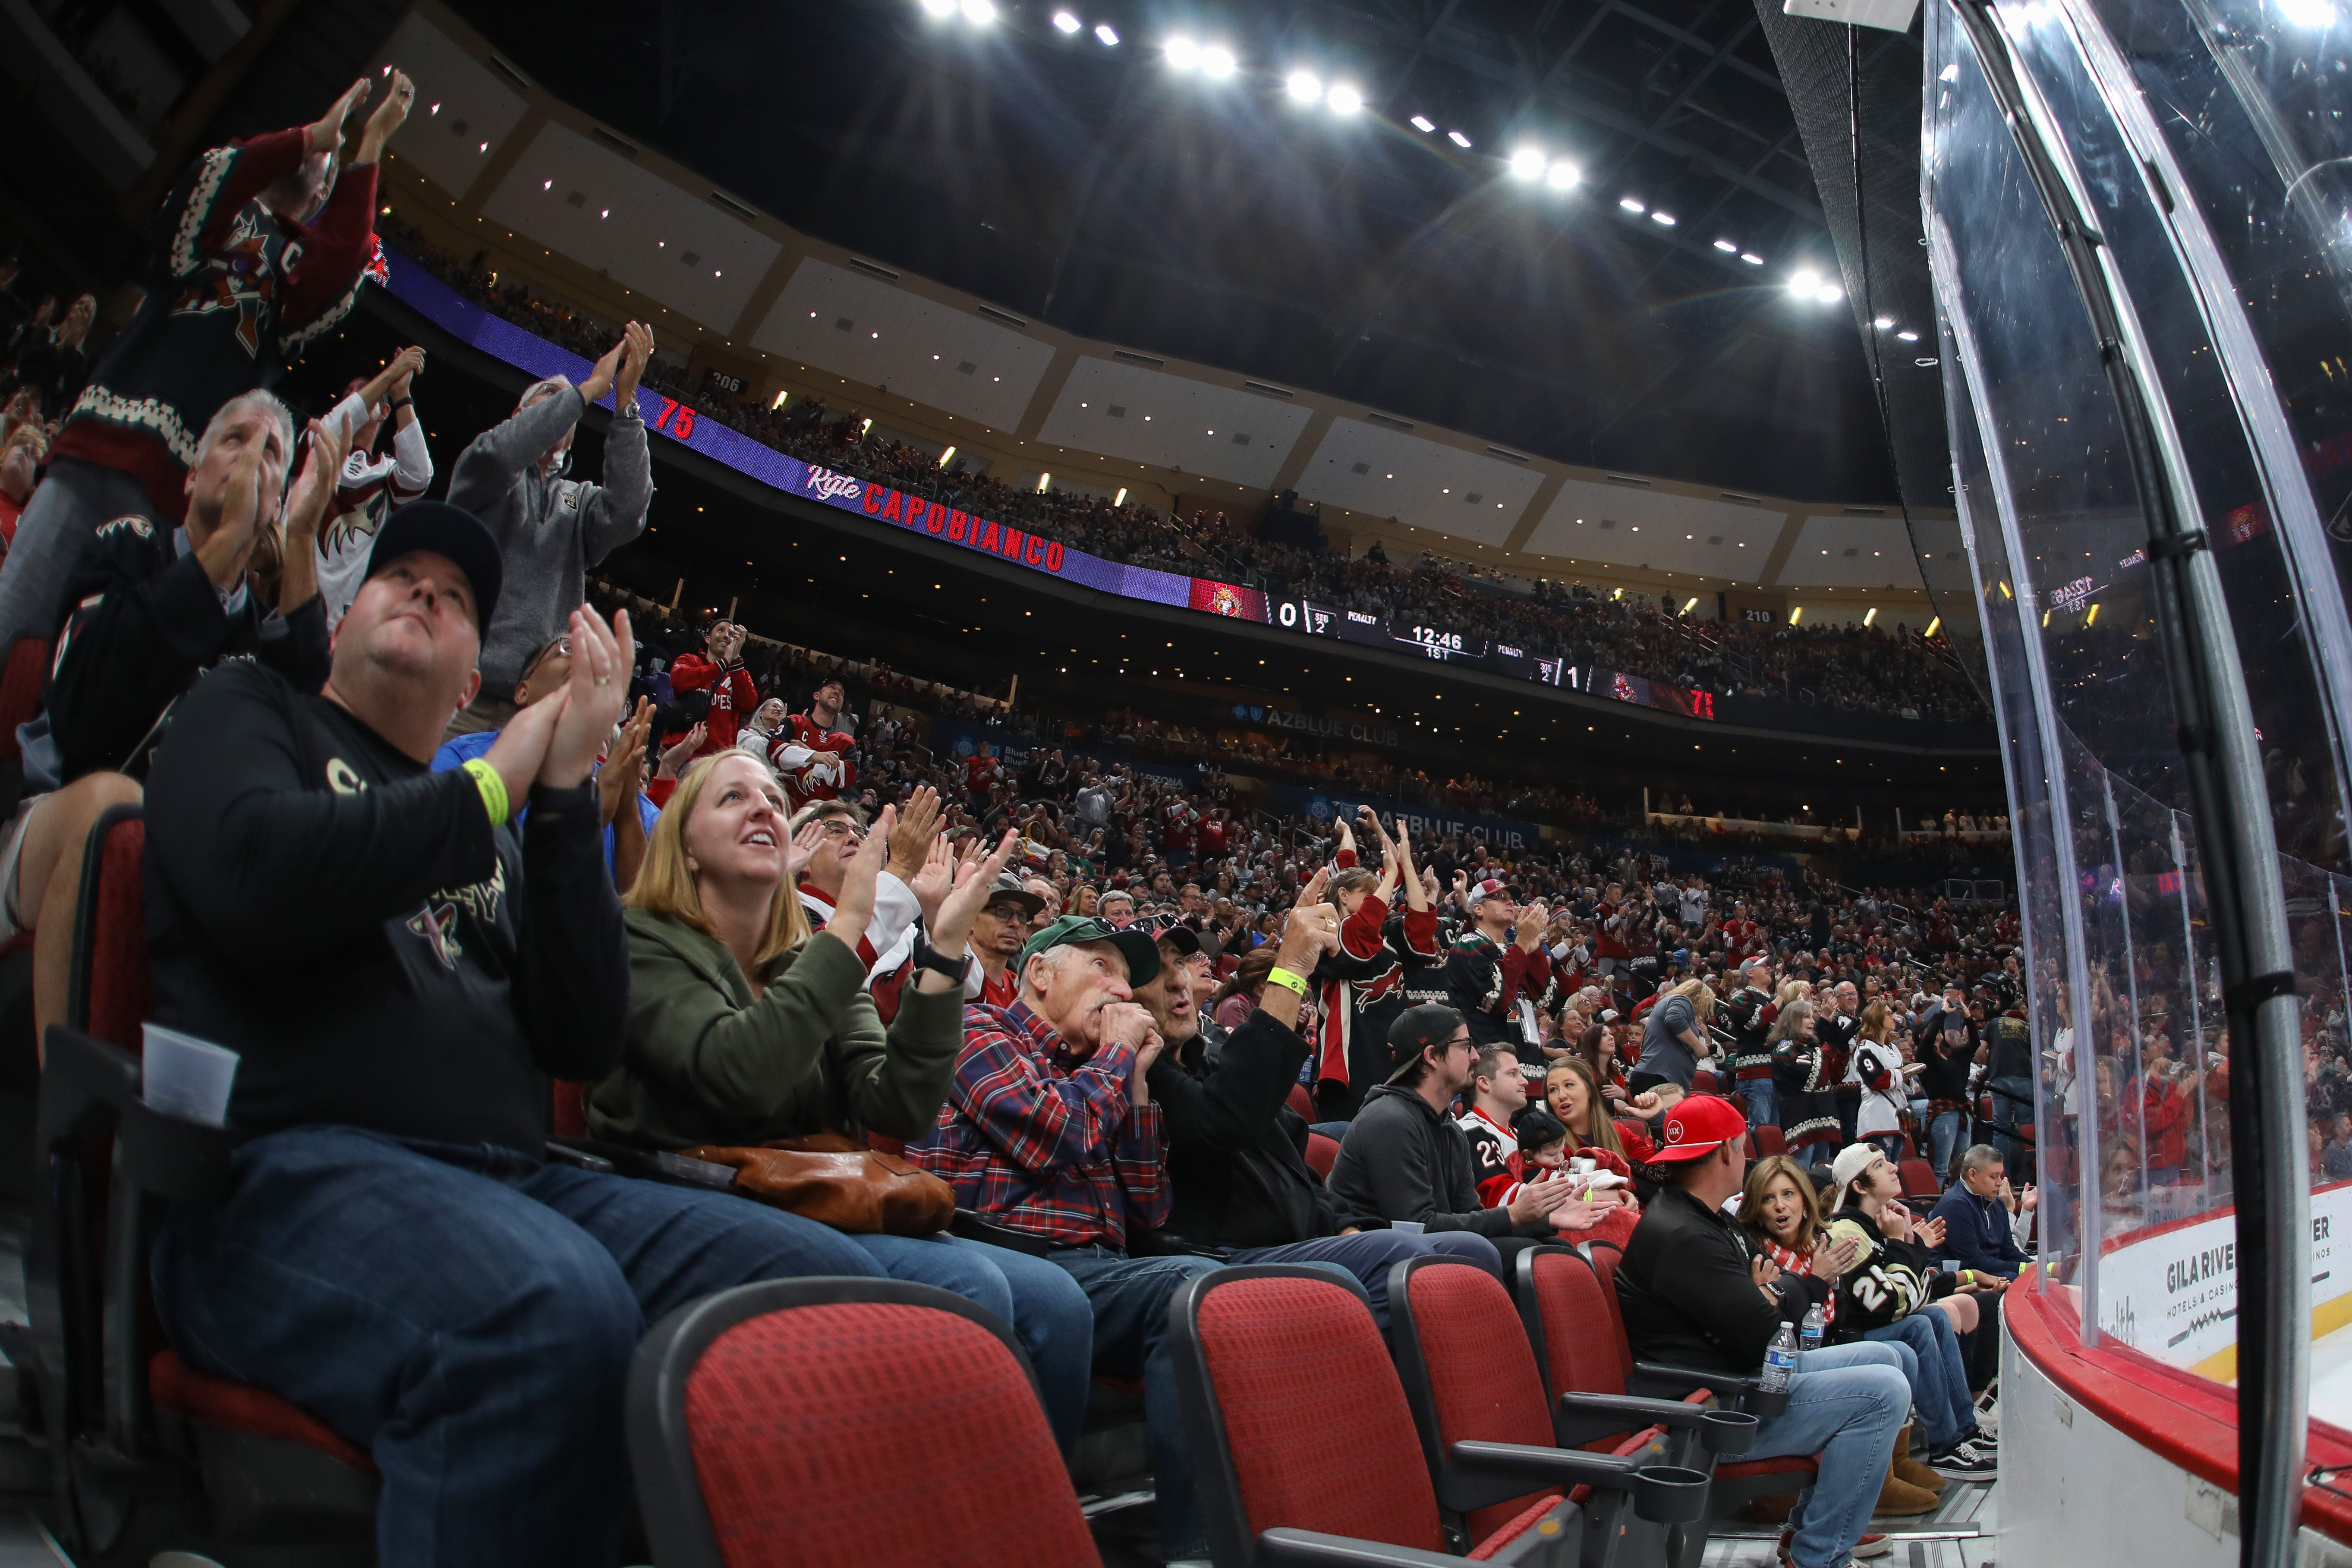 Den's Digest: Arizona Coyotes hold on to beat Ottawa Senators